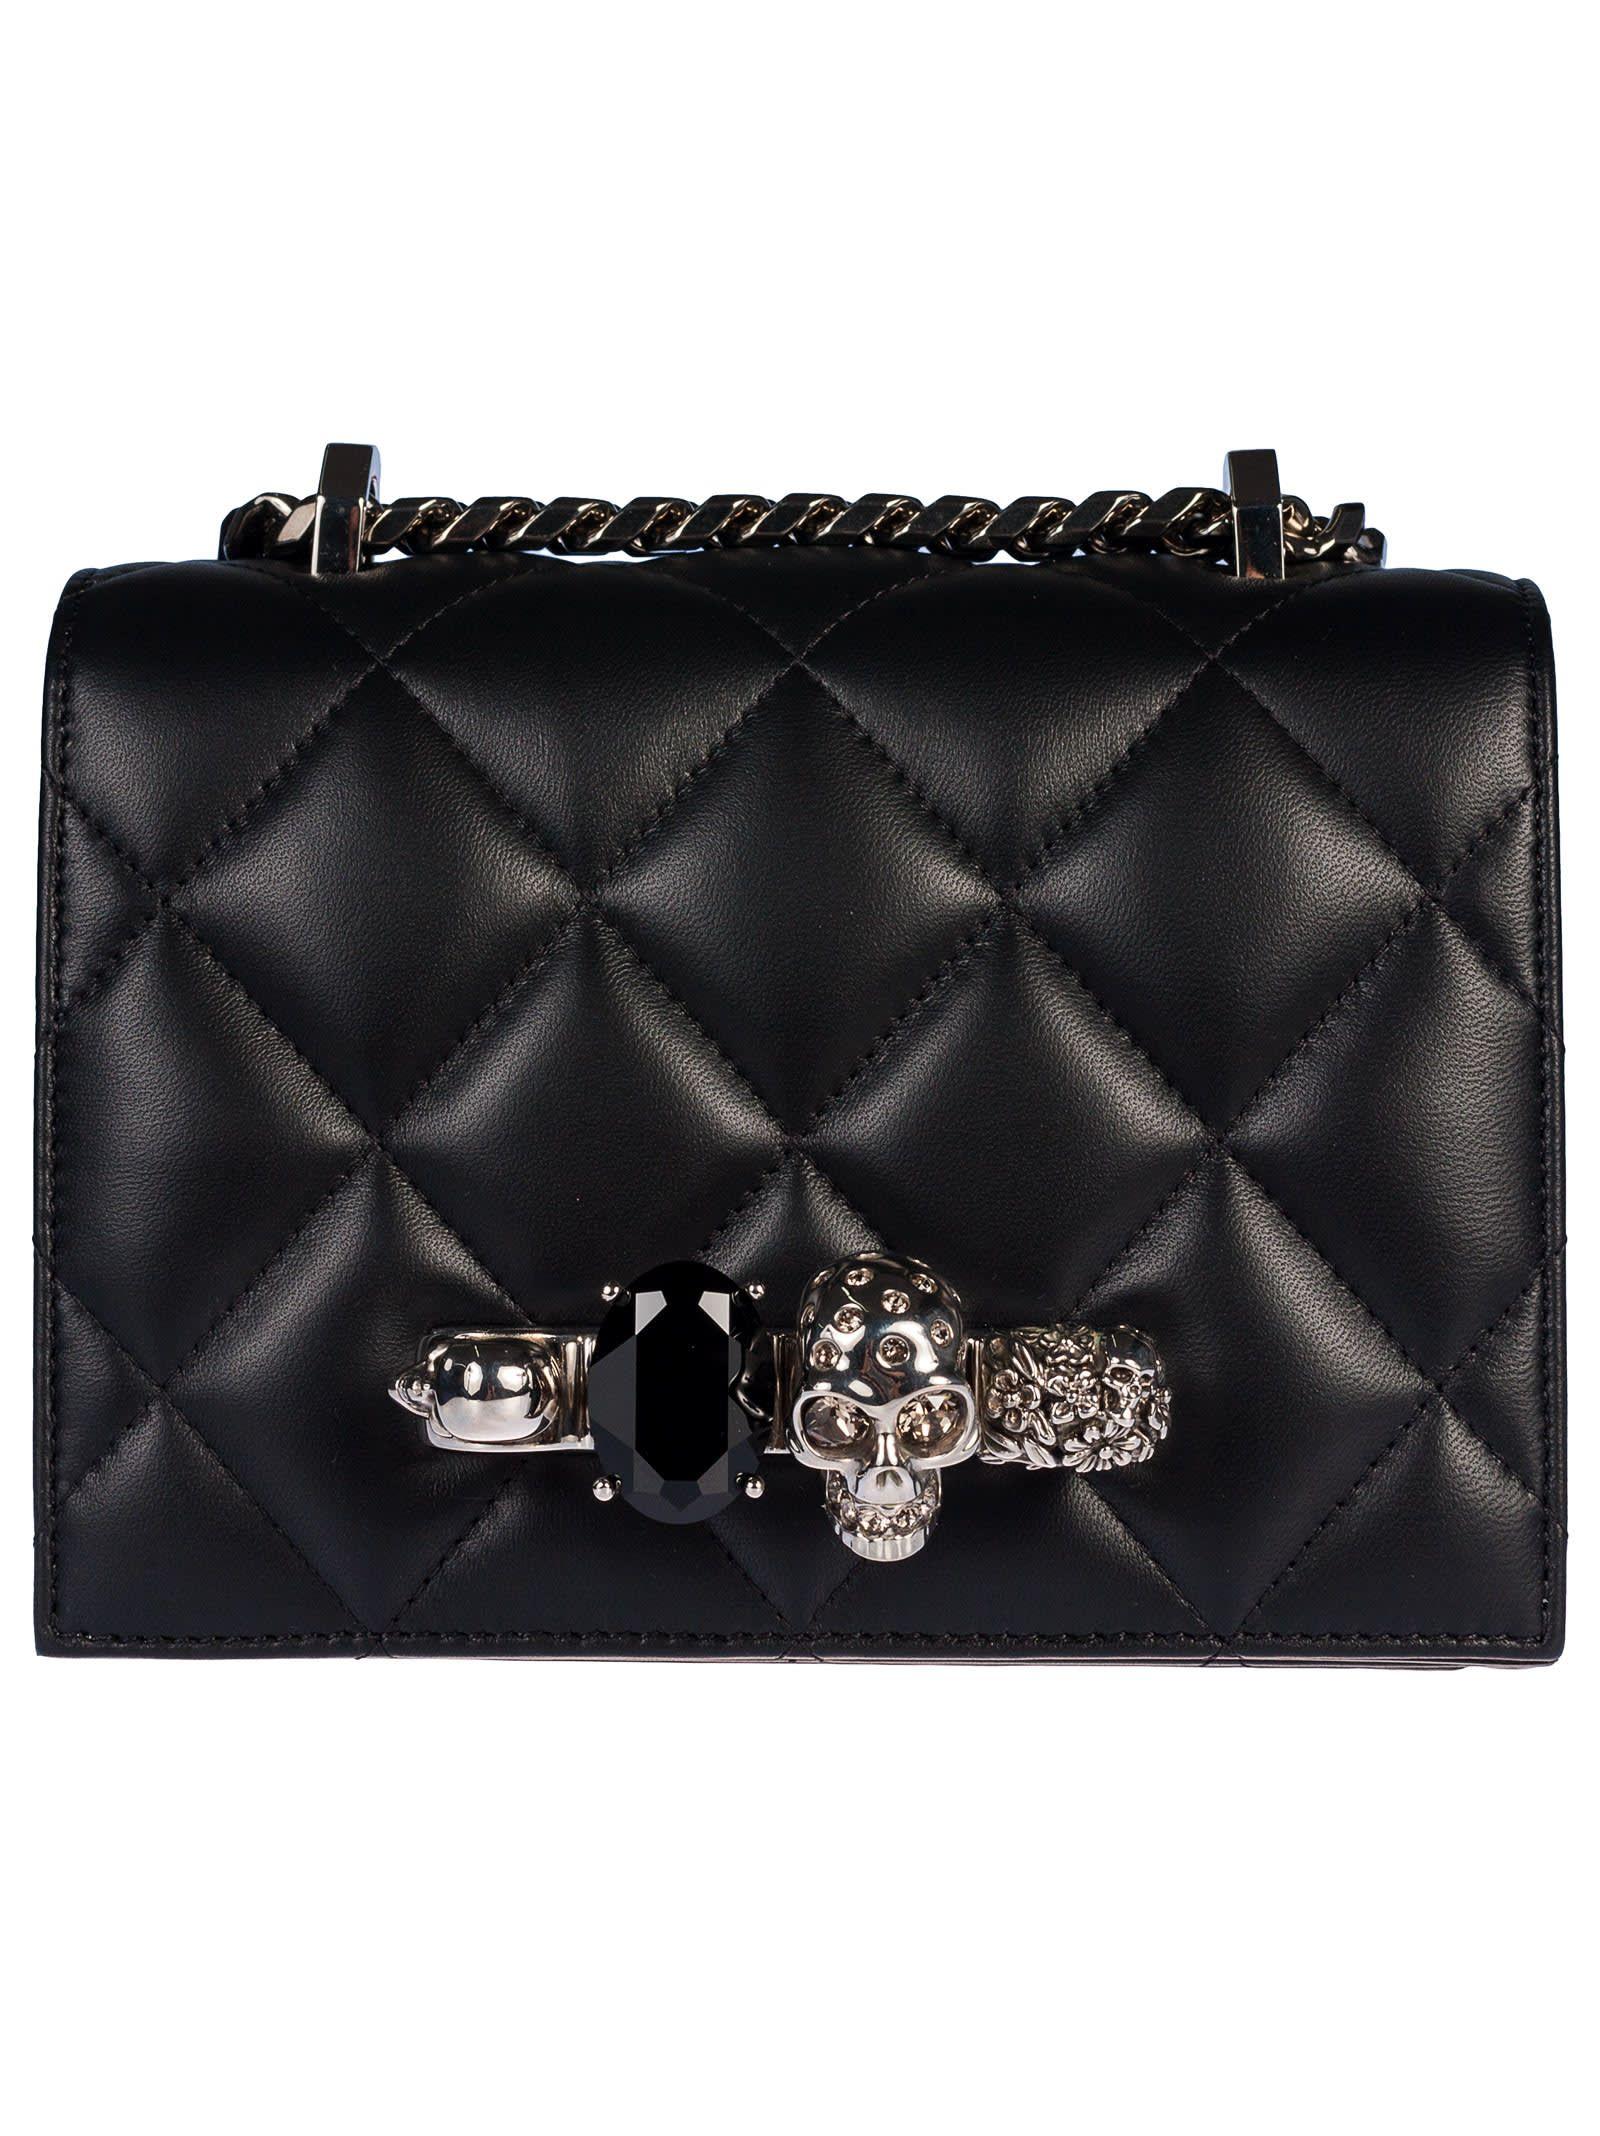 Small Jew Shoulder Bag from Alexander McQueen